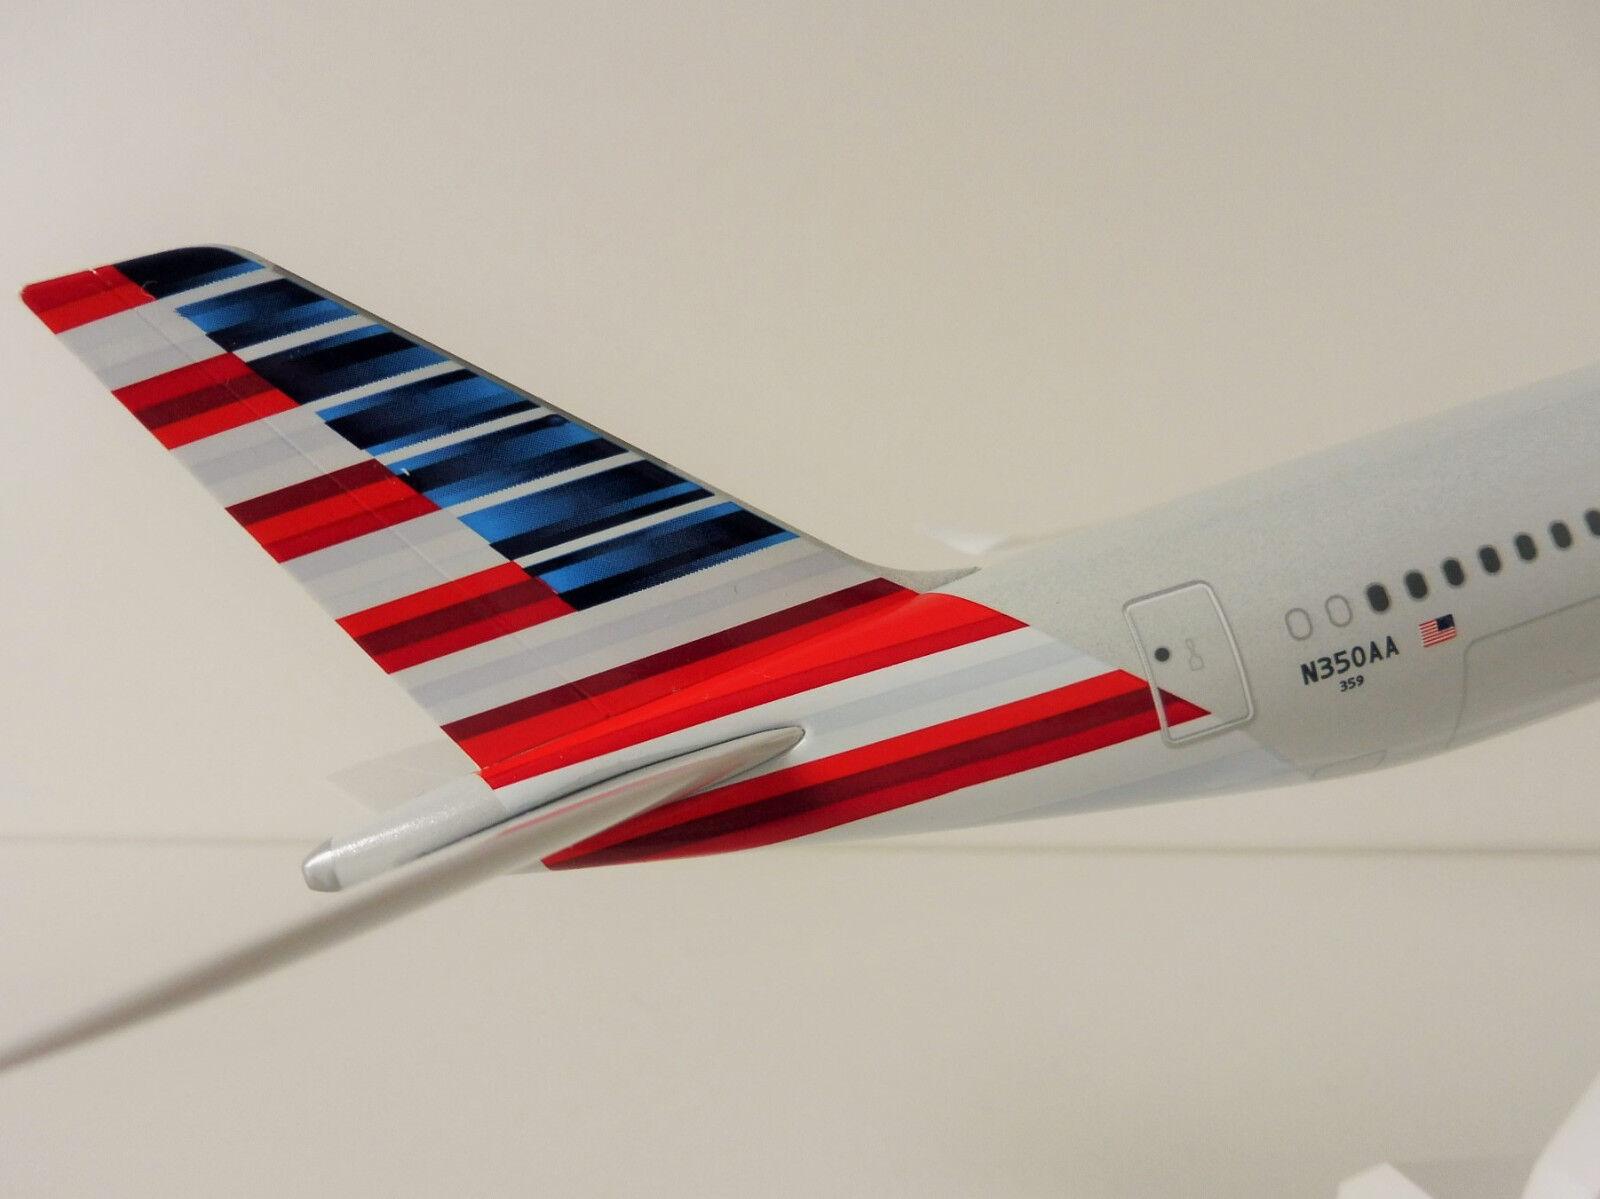 Airbus a350-900 American Airlines 1 200 skr916 Skymarks a350 a 350 XWB